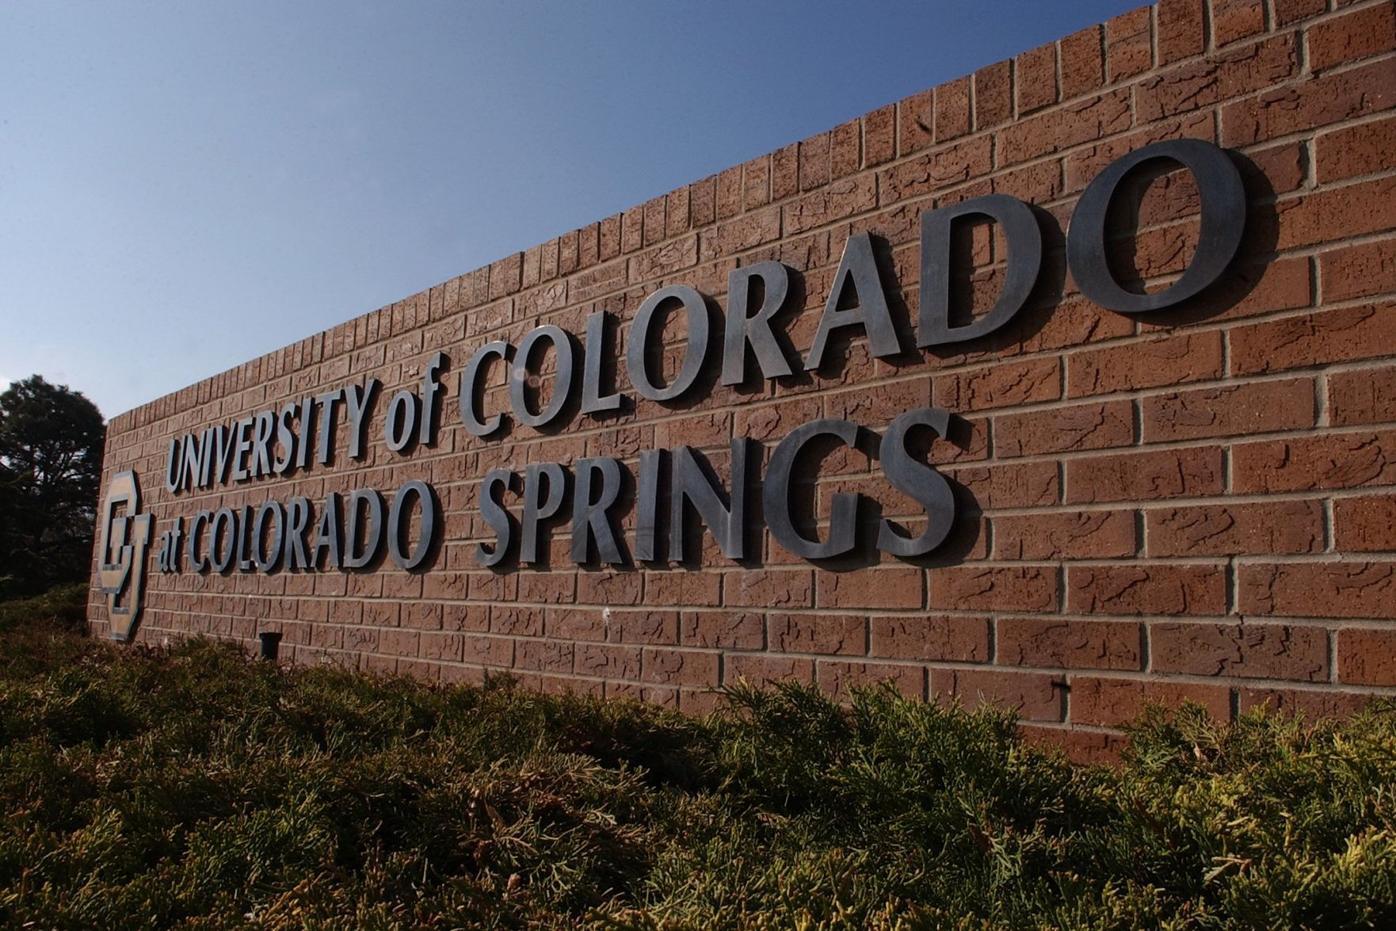 University of Colorado at Colorado Springs sign Tuesday, April 25, 2005. Photo by Hunter McRae